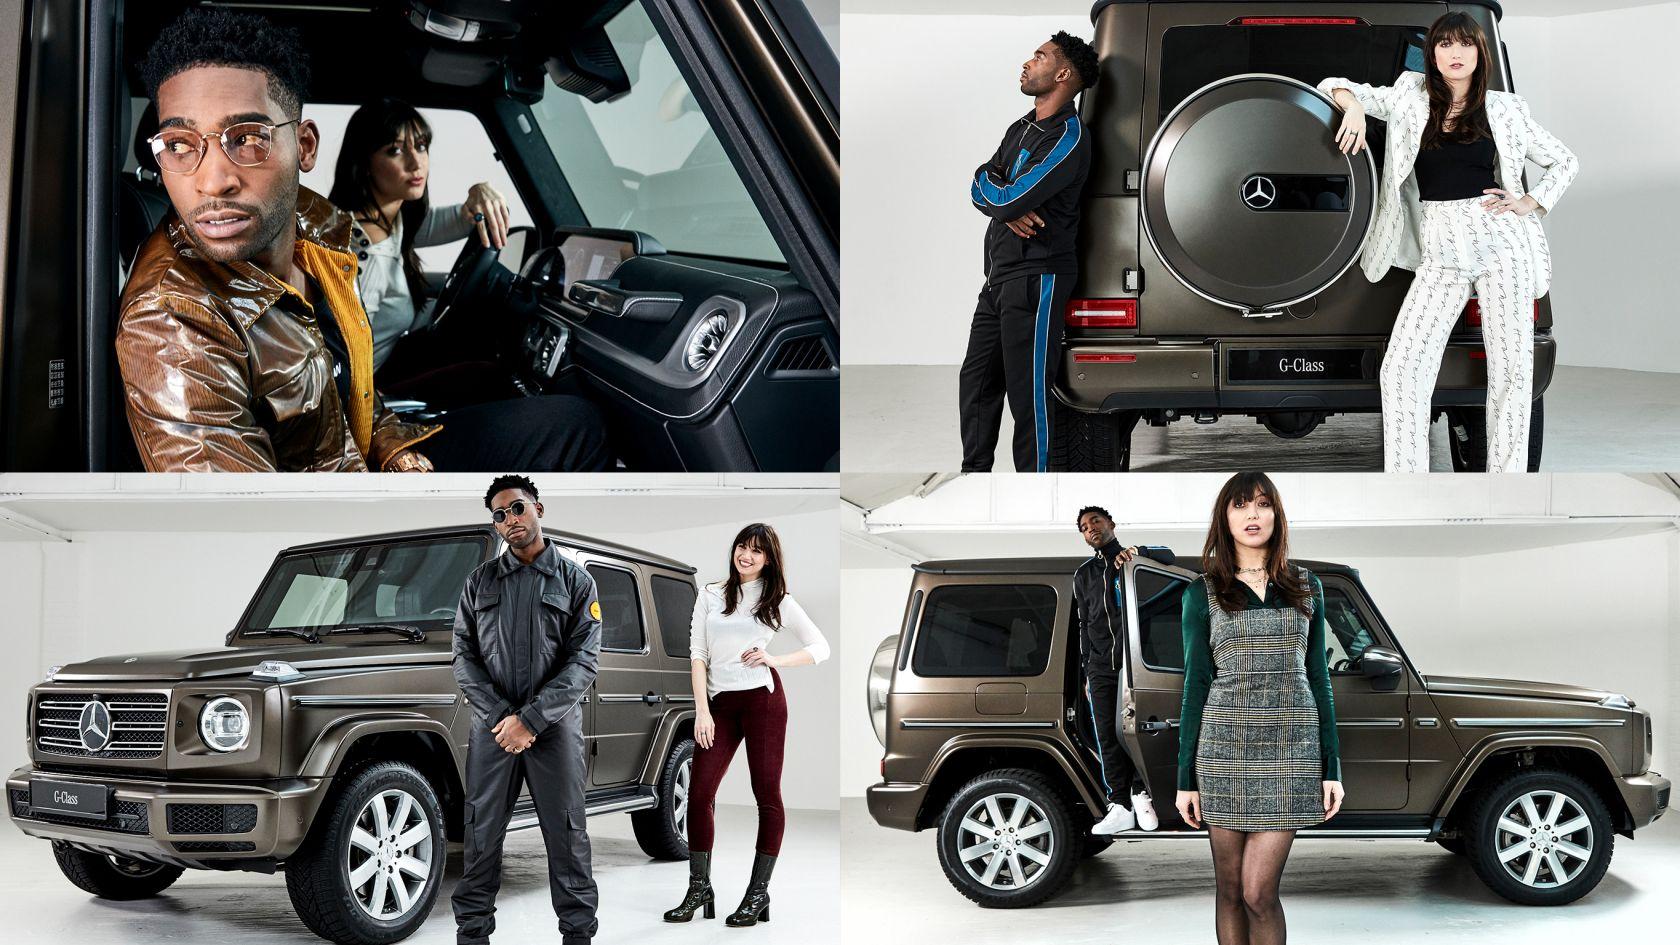 Mercedes Benz G Wagon Campaign